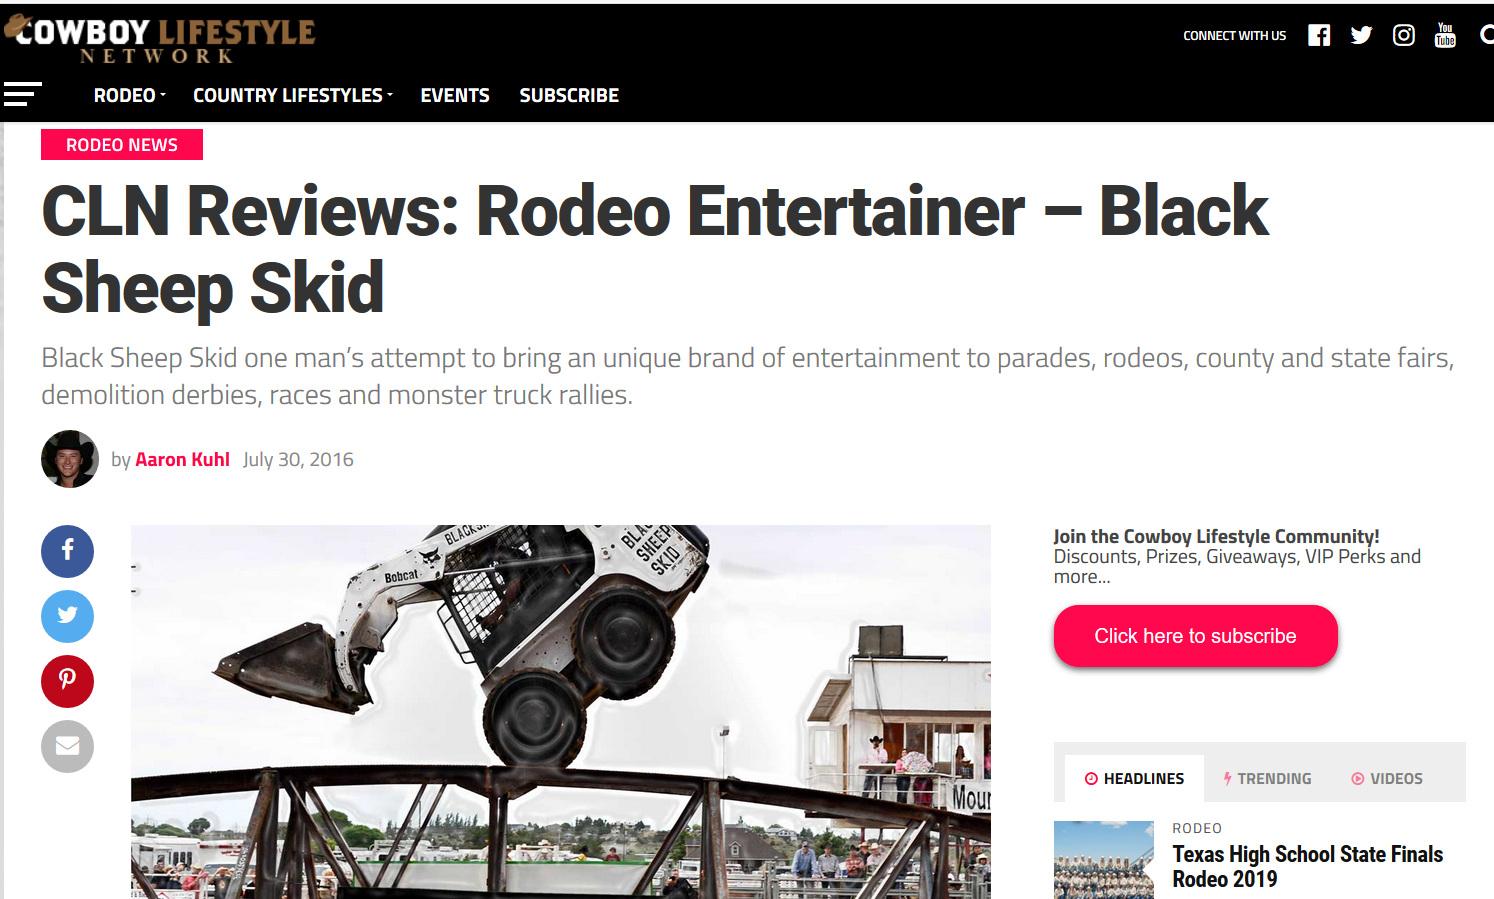 COWBOY LIFESTYLE NETWORK - Blacksheep Skid received this great review from Cowboy Lifestyle Network.